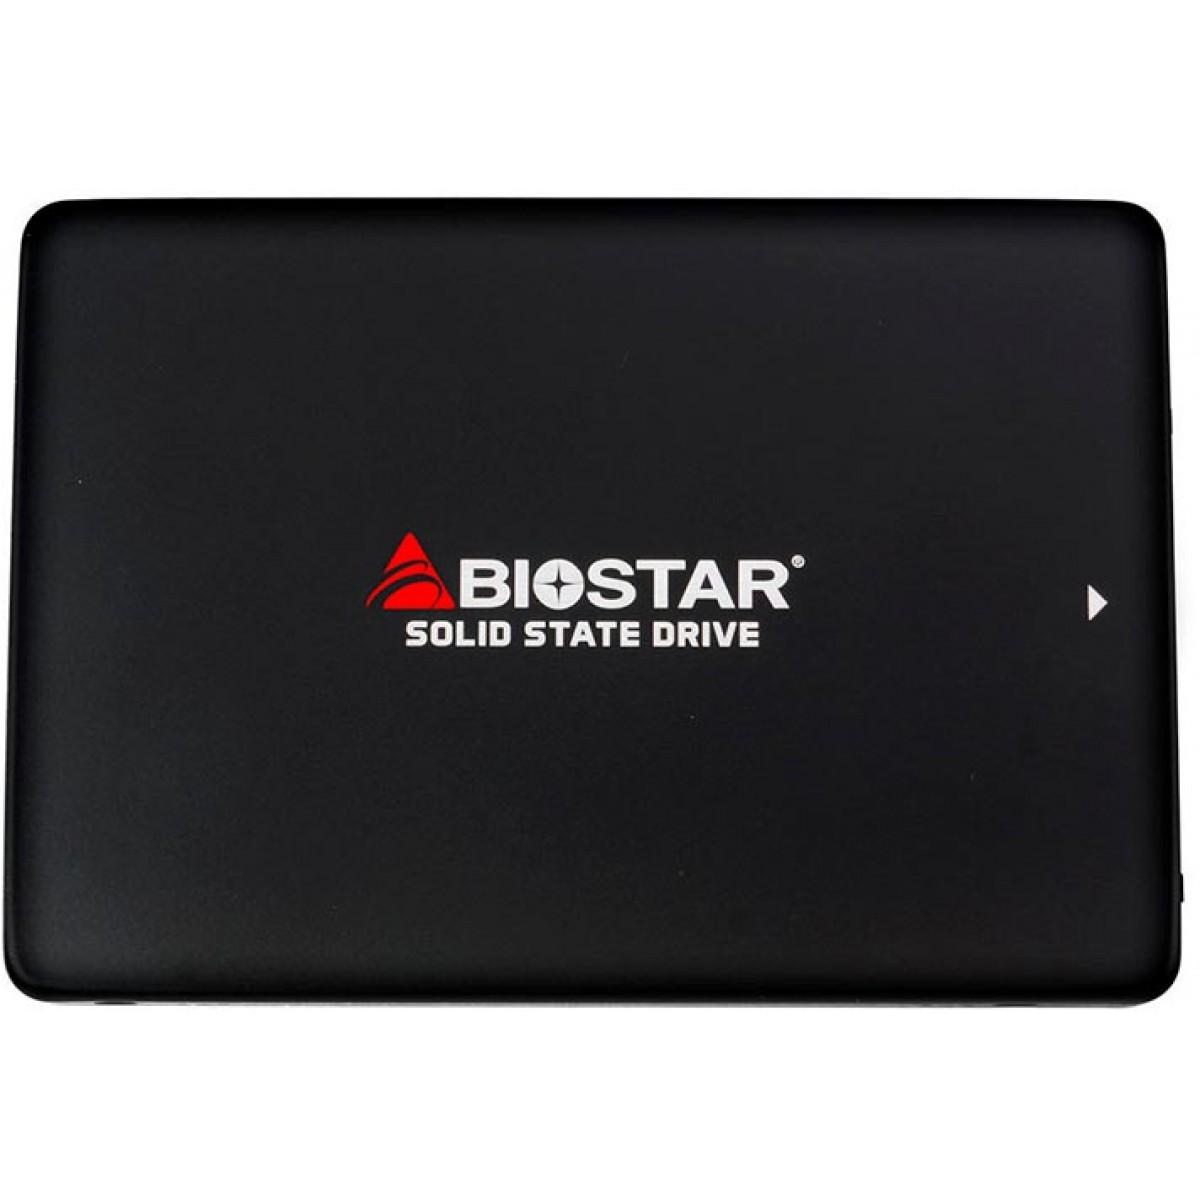 SSD Biostar S120 1TB, Sata III, Leitura 550MBs Gravação 525MBs, SA902S2E3T-PM2BL-BS2